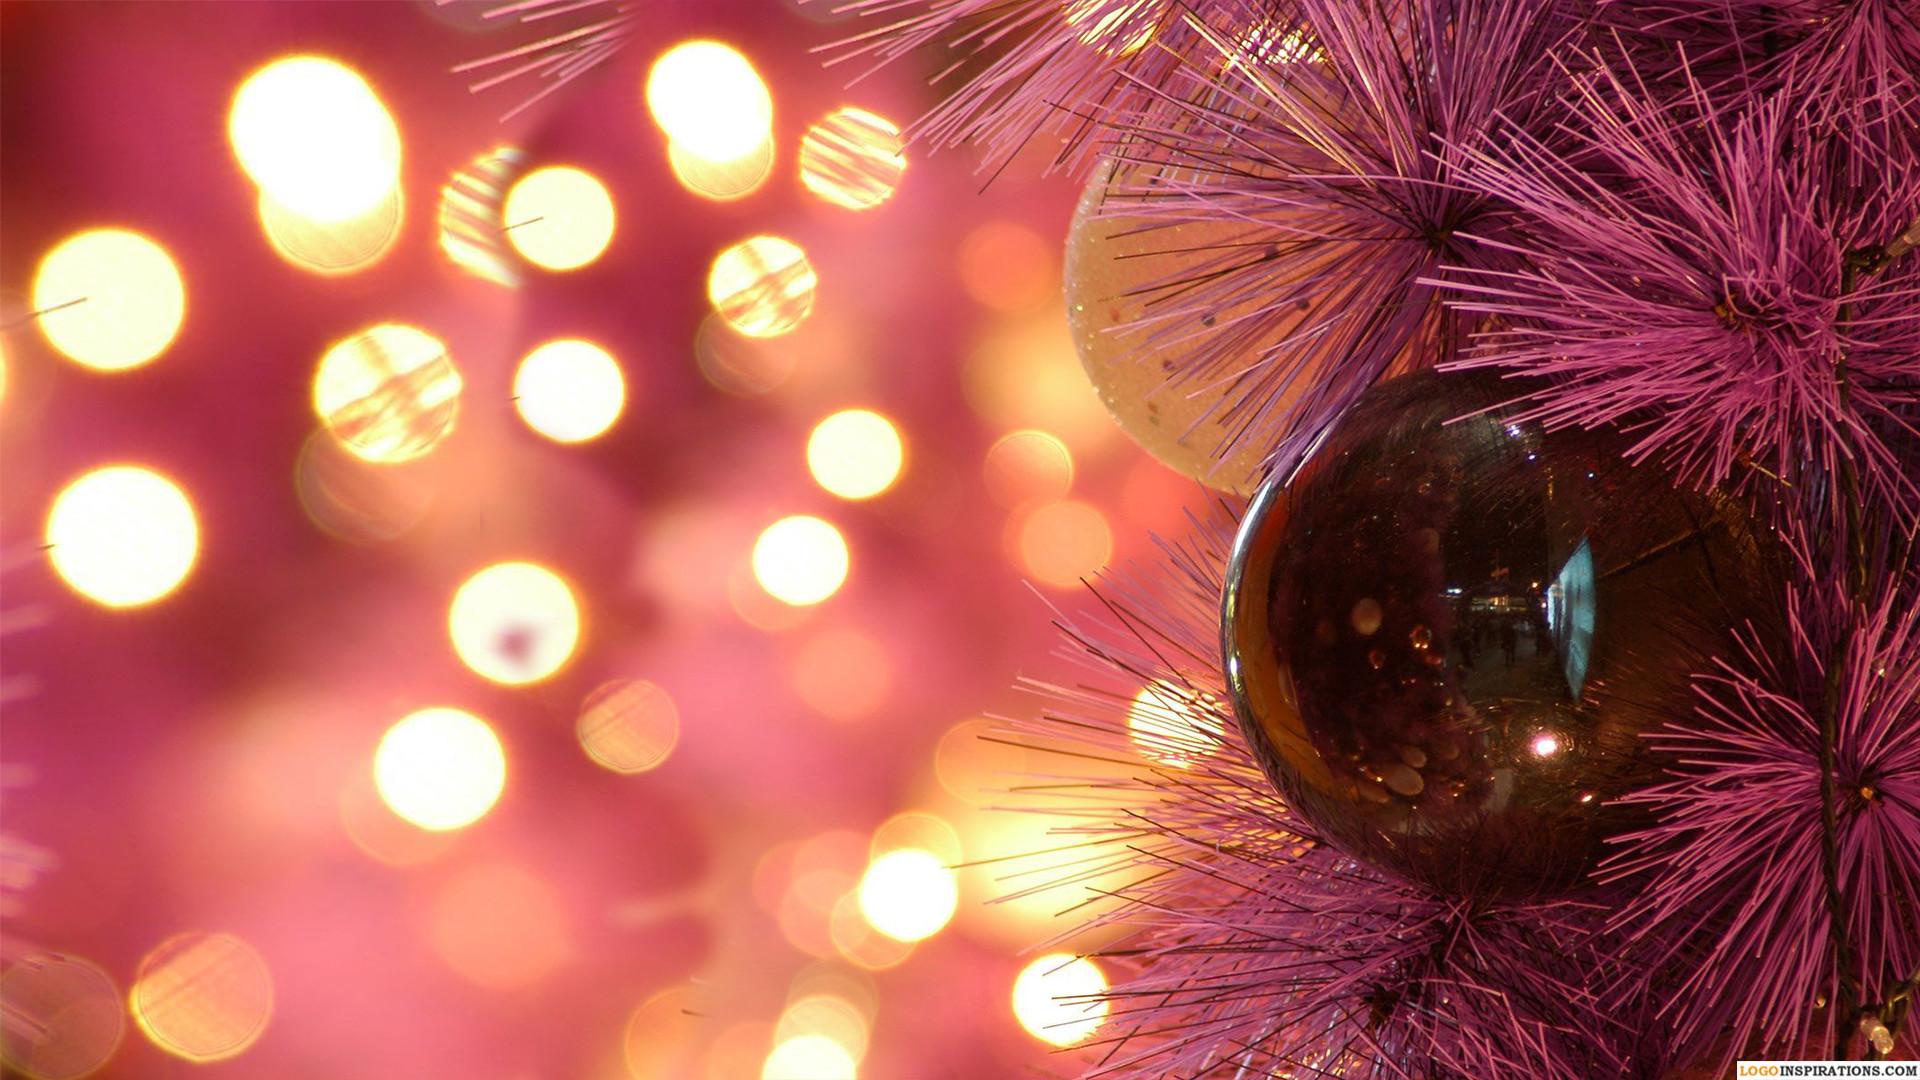 Beautiful HD Christmas Lights Wallpaper